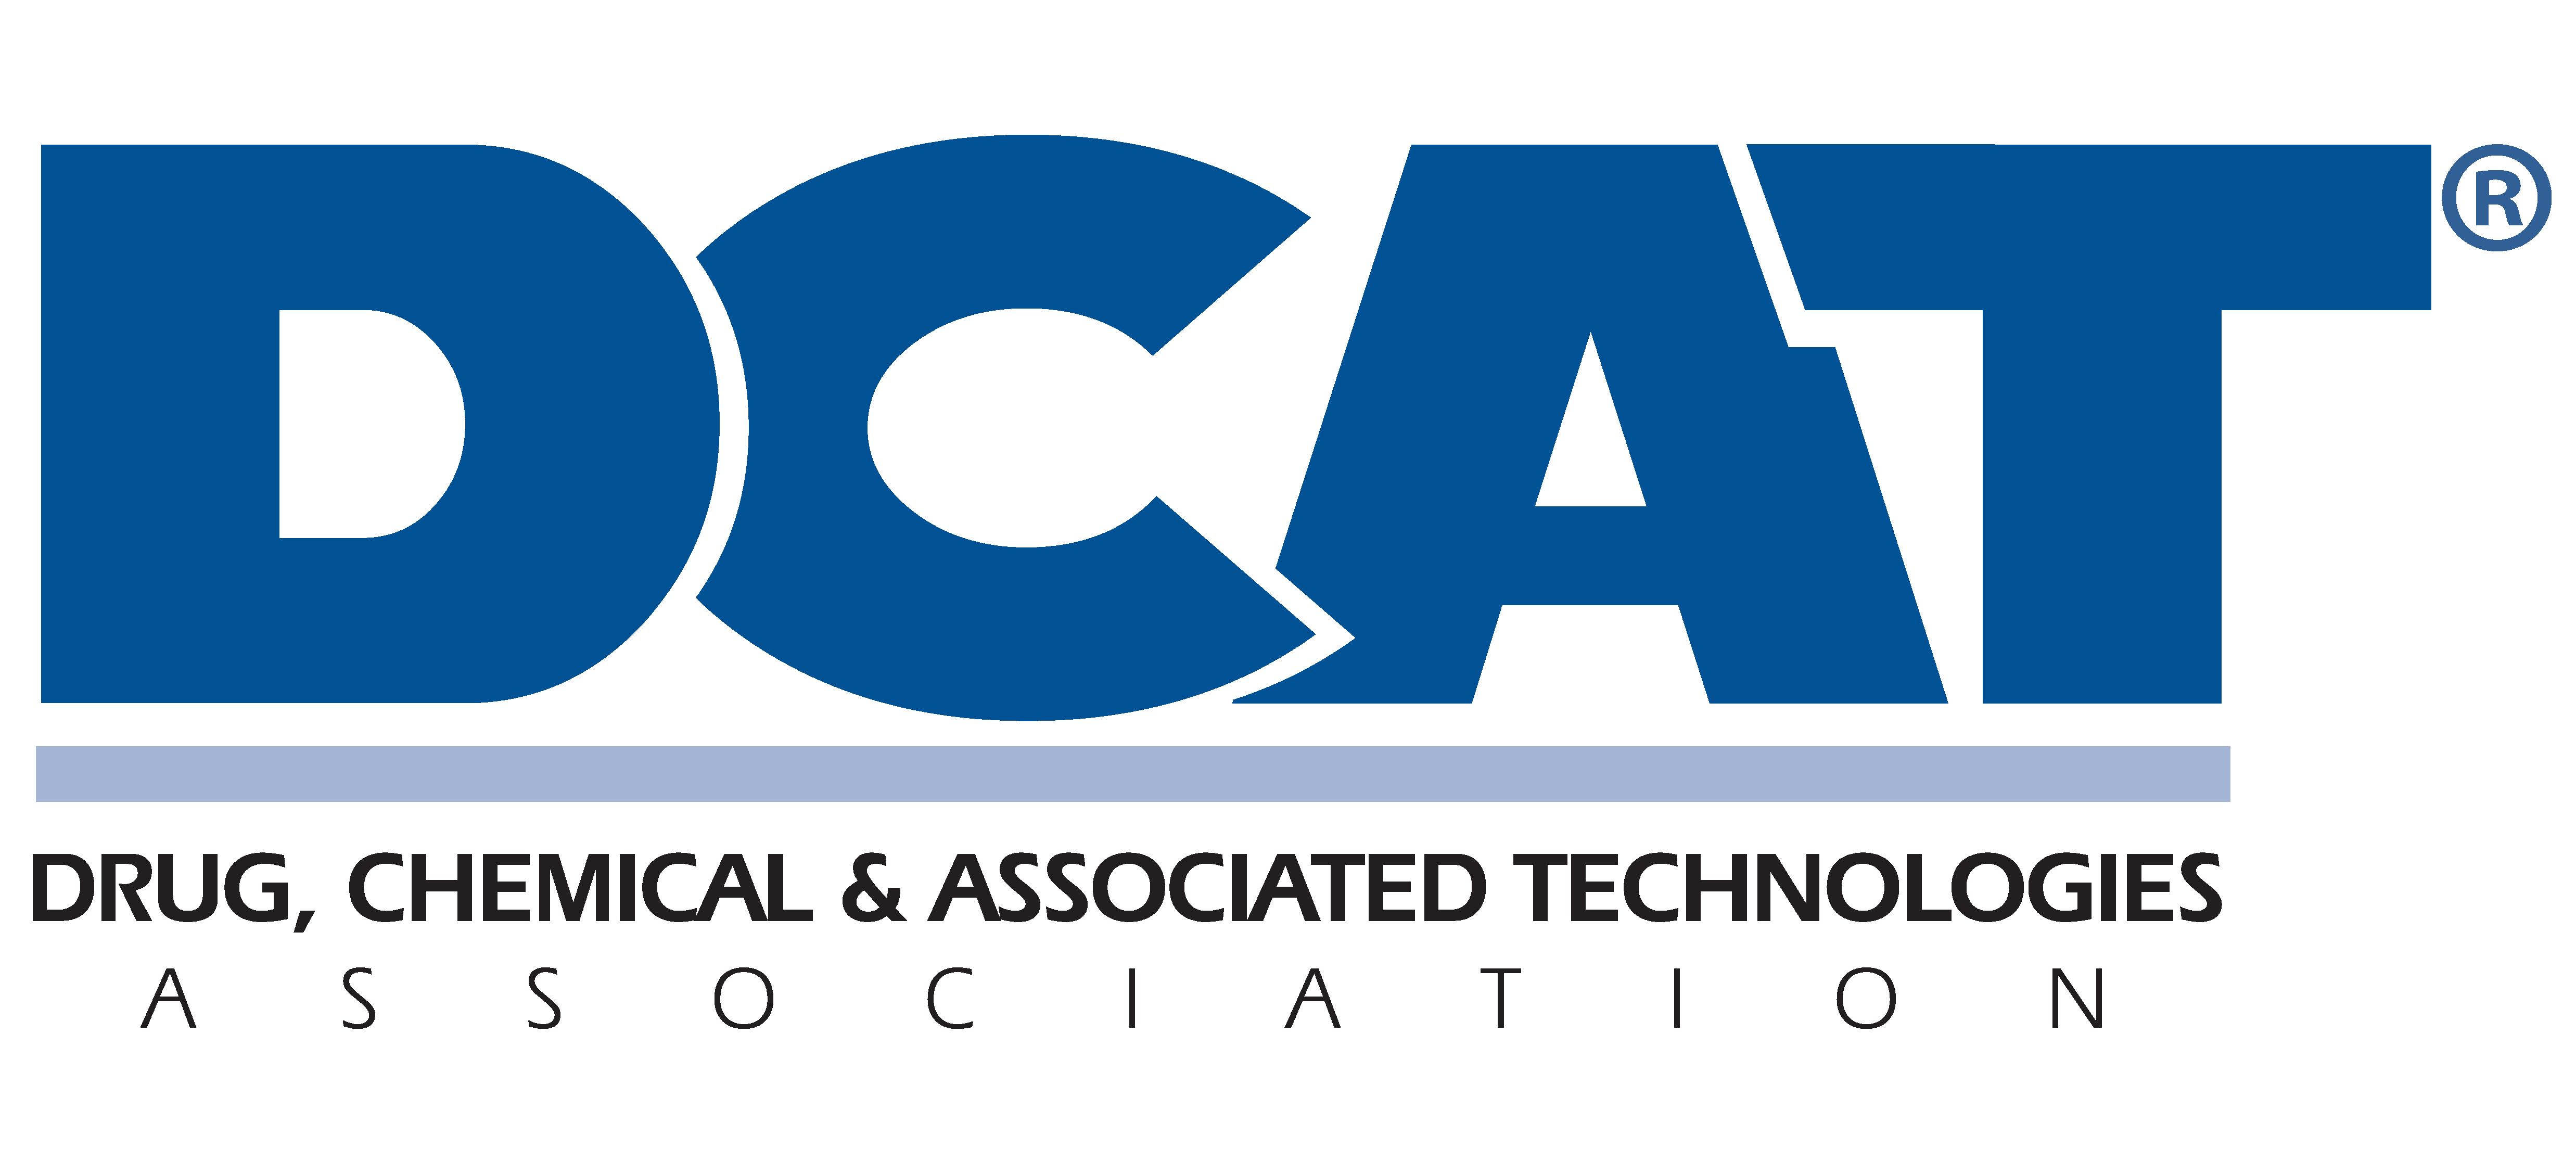 Drug, Chemical & Associated Technologies Association (DCAT